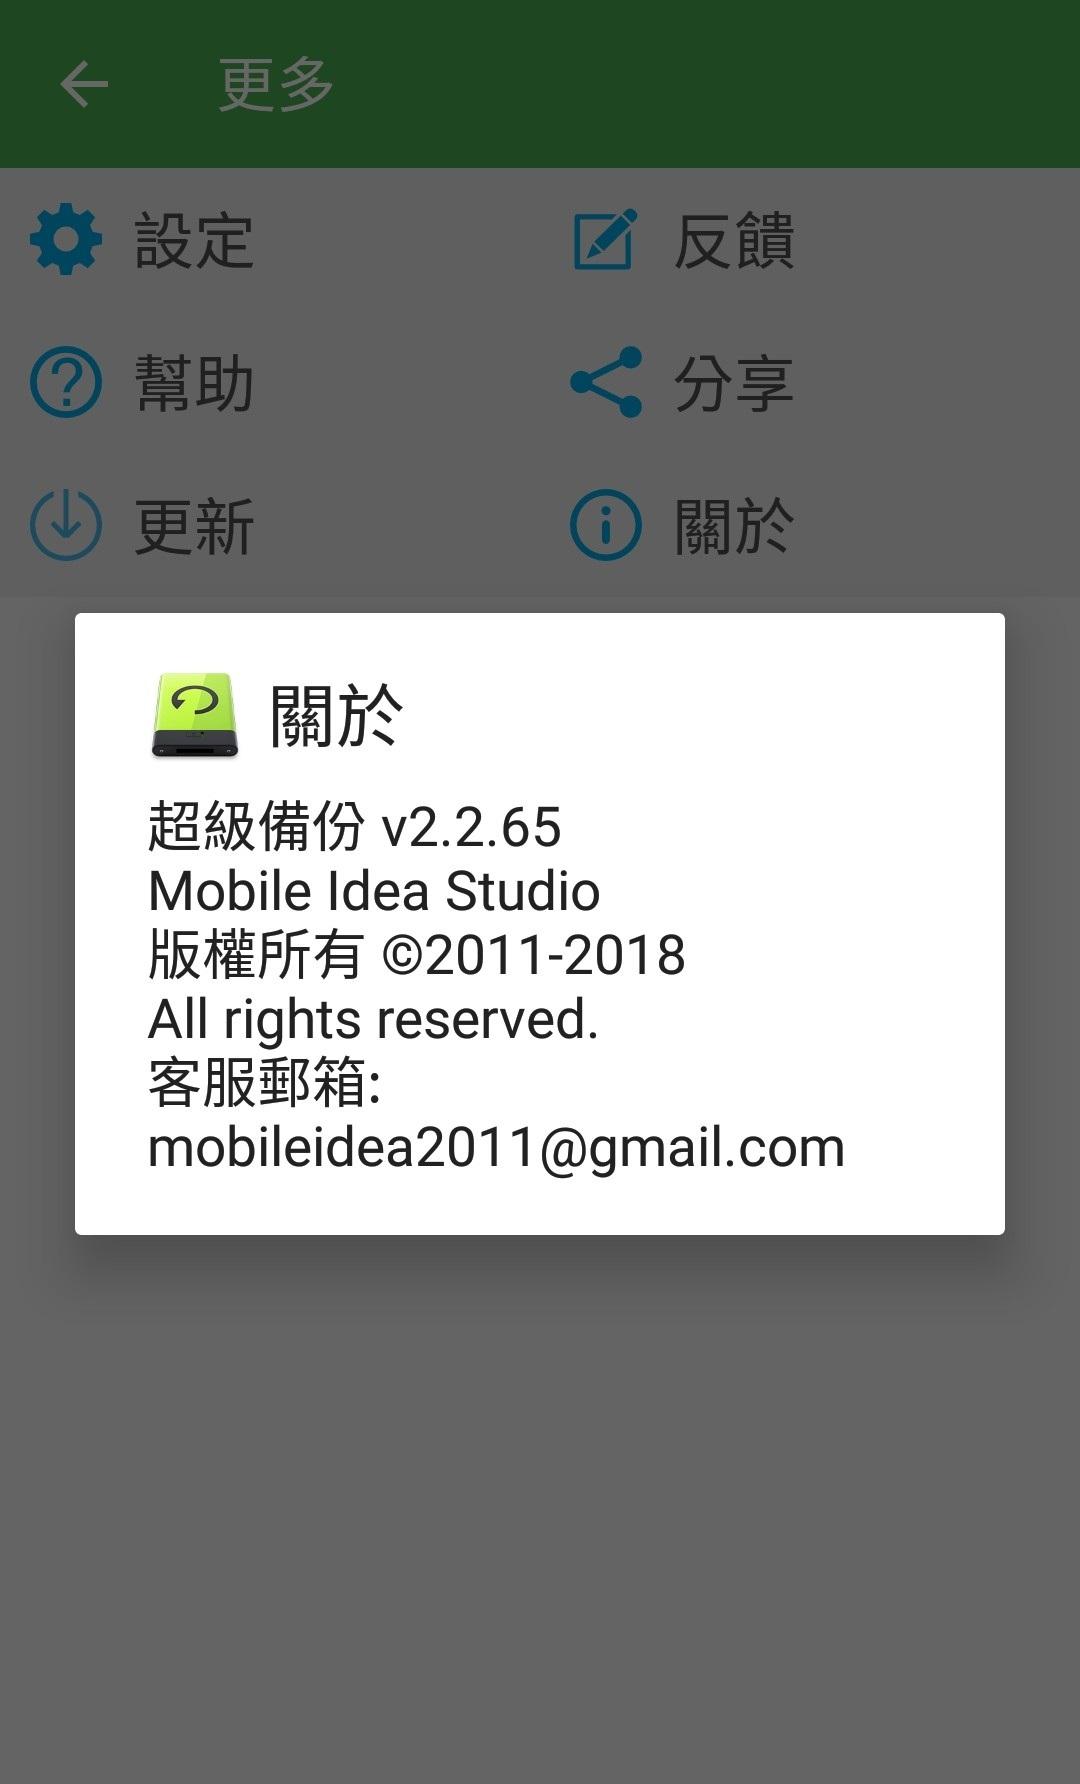 202118h664y3yf4s47hg6z